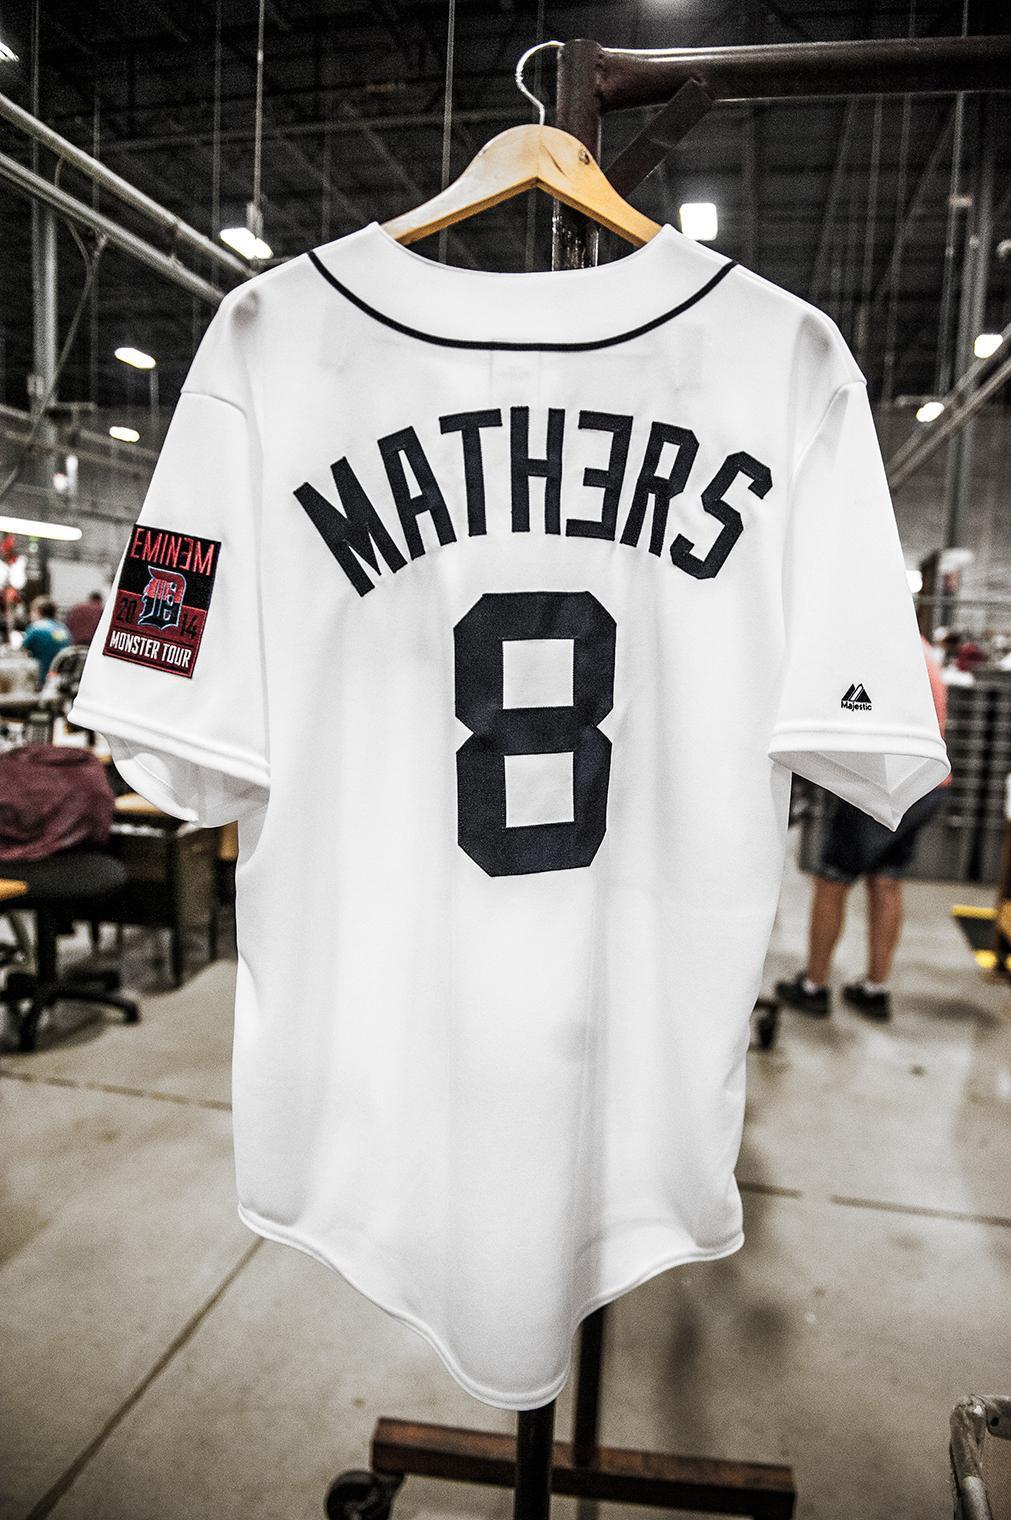 Eminem Tigers jersey